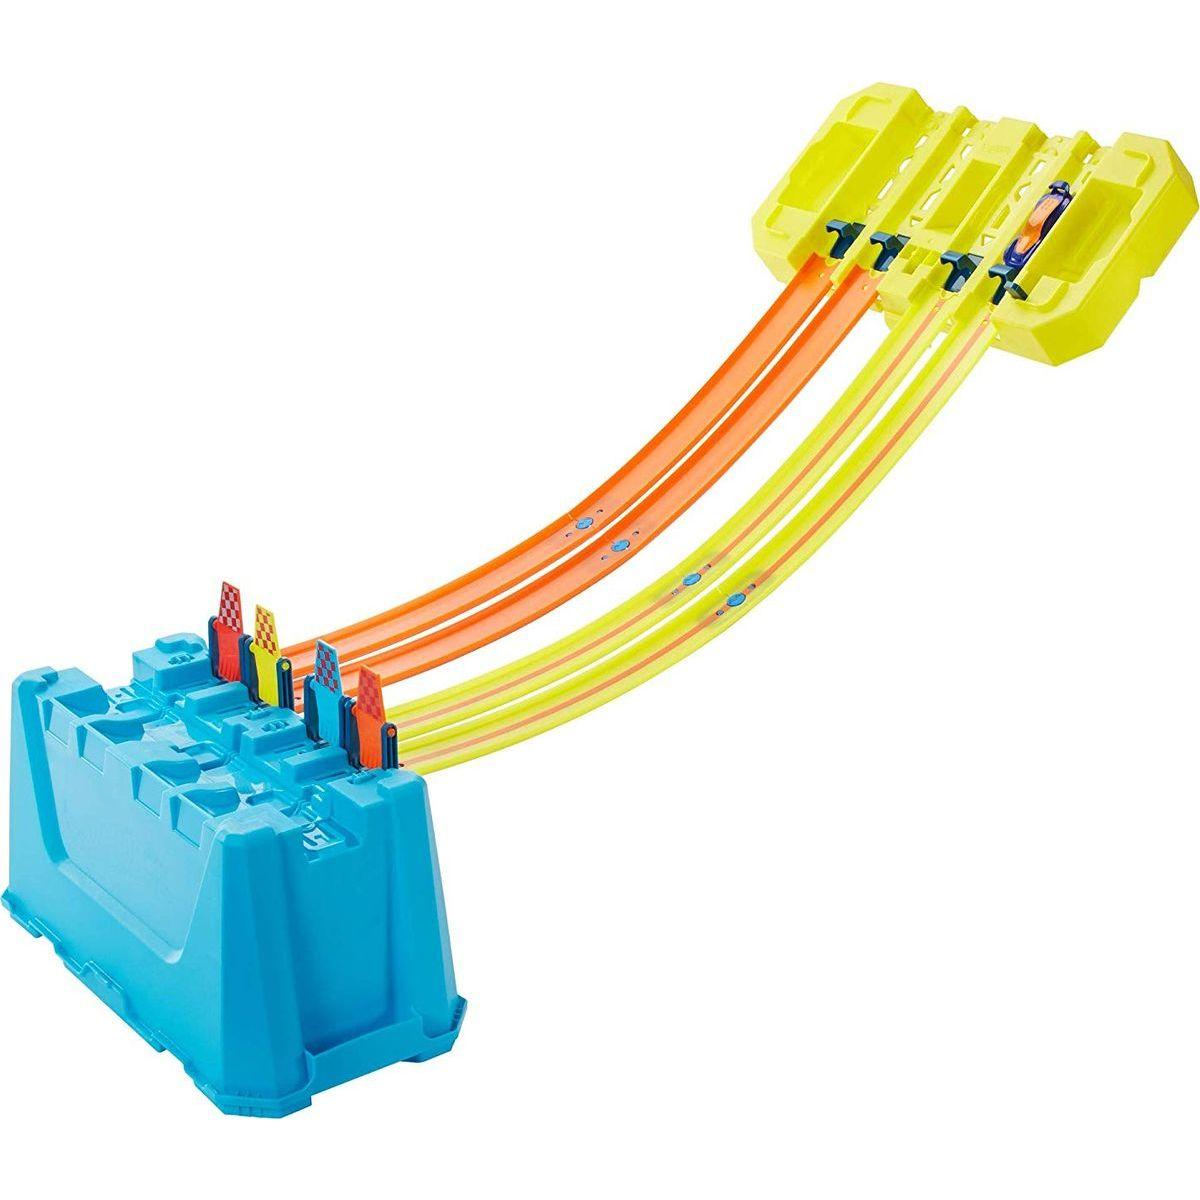 Mattel Hot Wheels track builder box super zostup